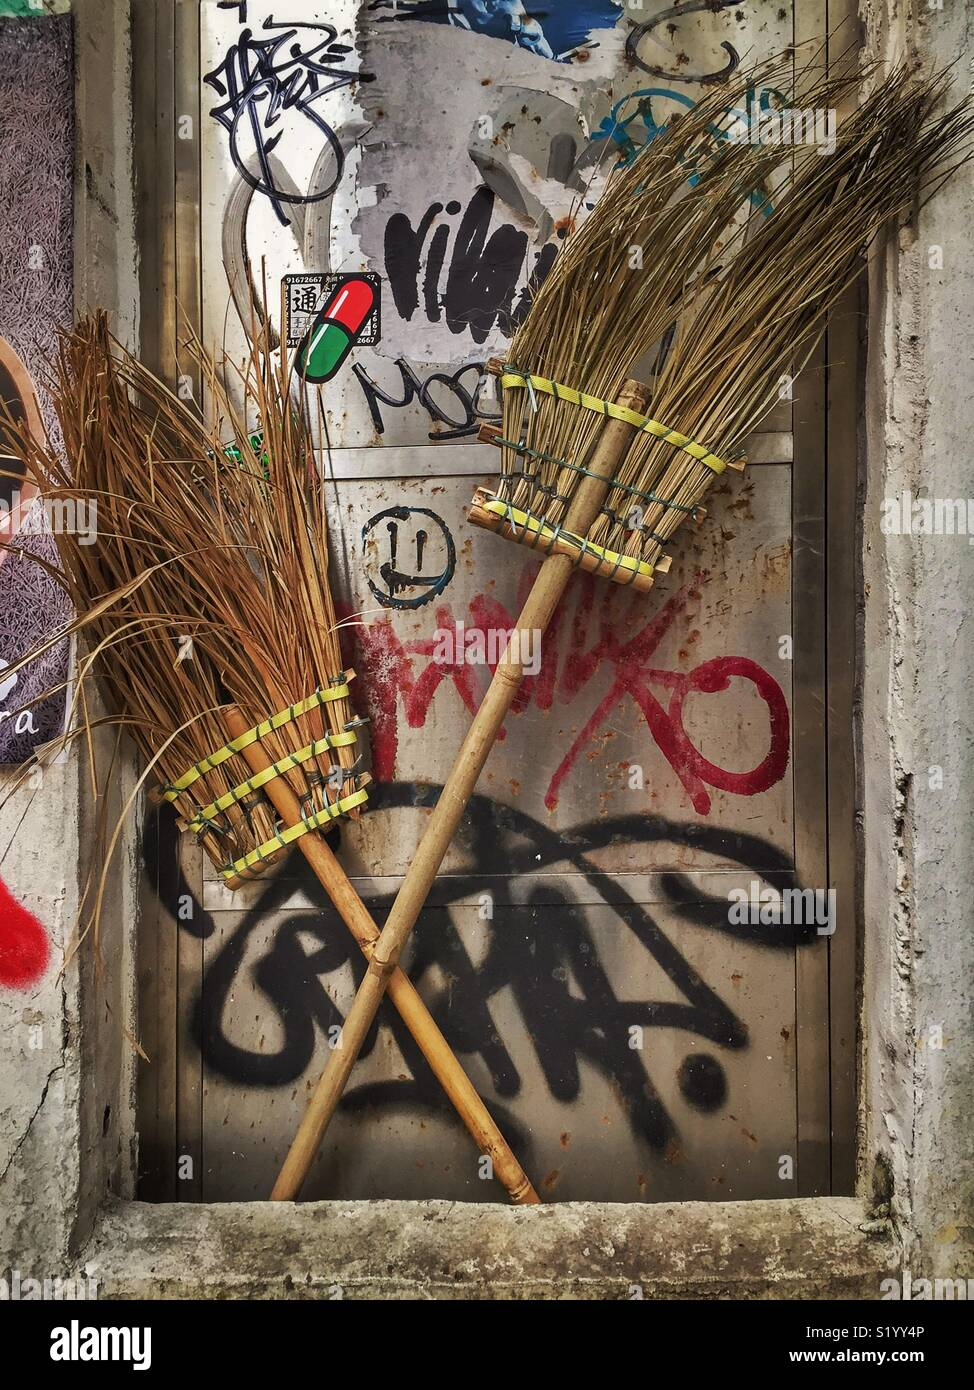 Traditionelle Chinesische Besen und Graffiti, Sai Ying Pun, Hong Kong Island Stockfoto